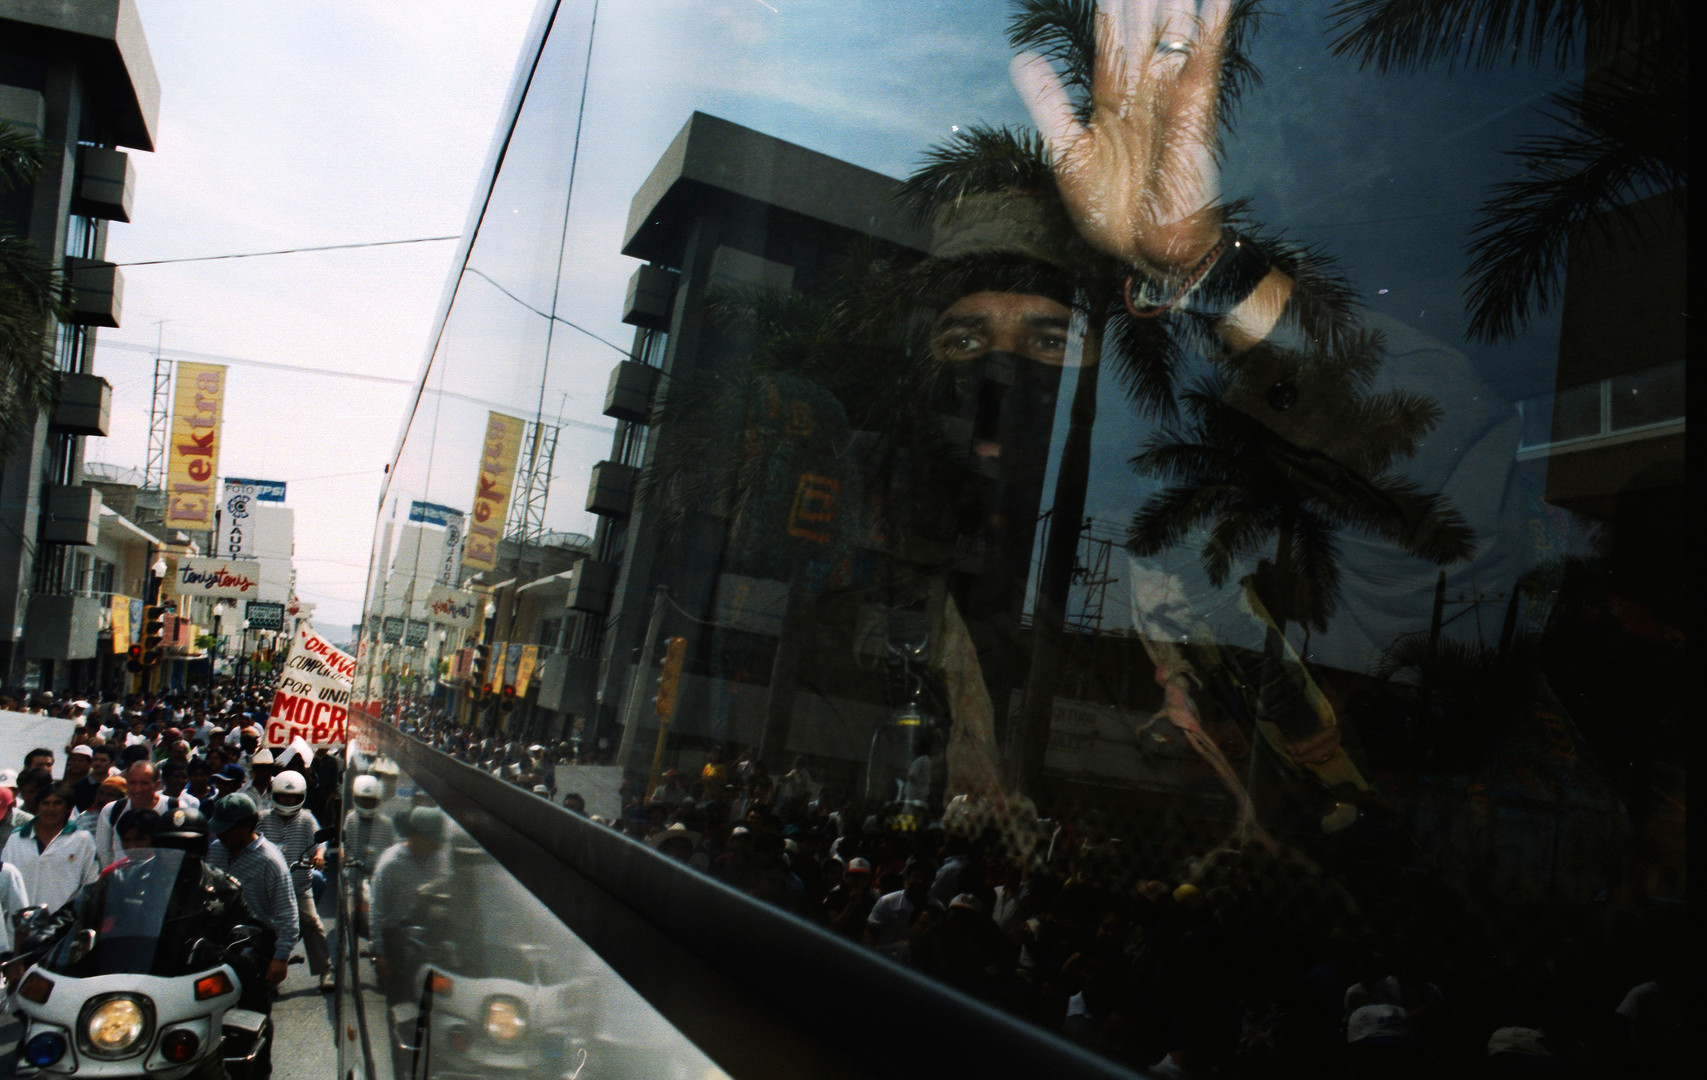 Subcomandante Marcos OrganizationZapatista Army of National Liberation